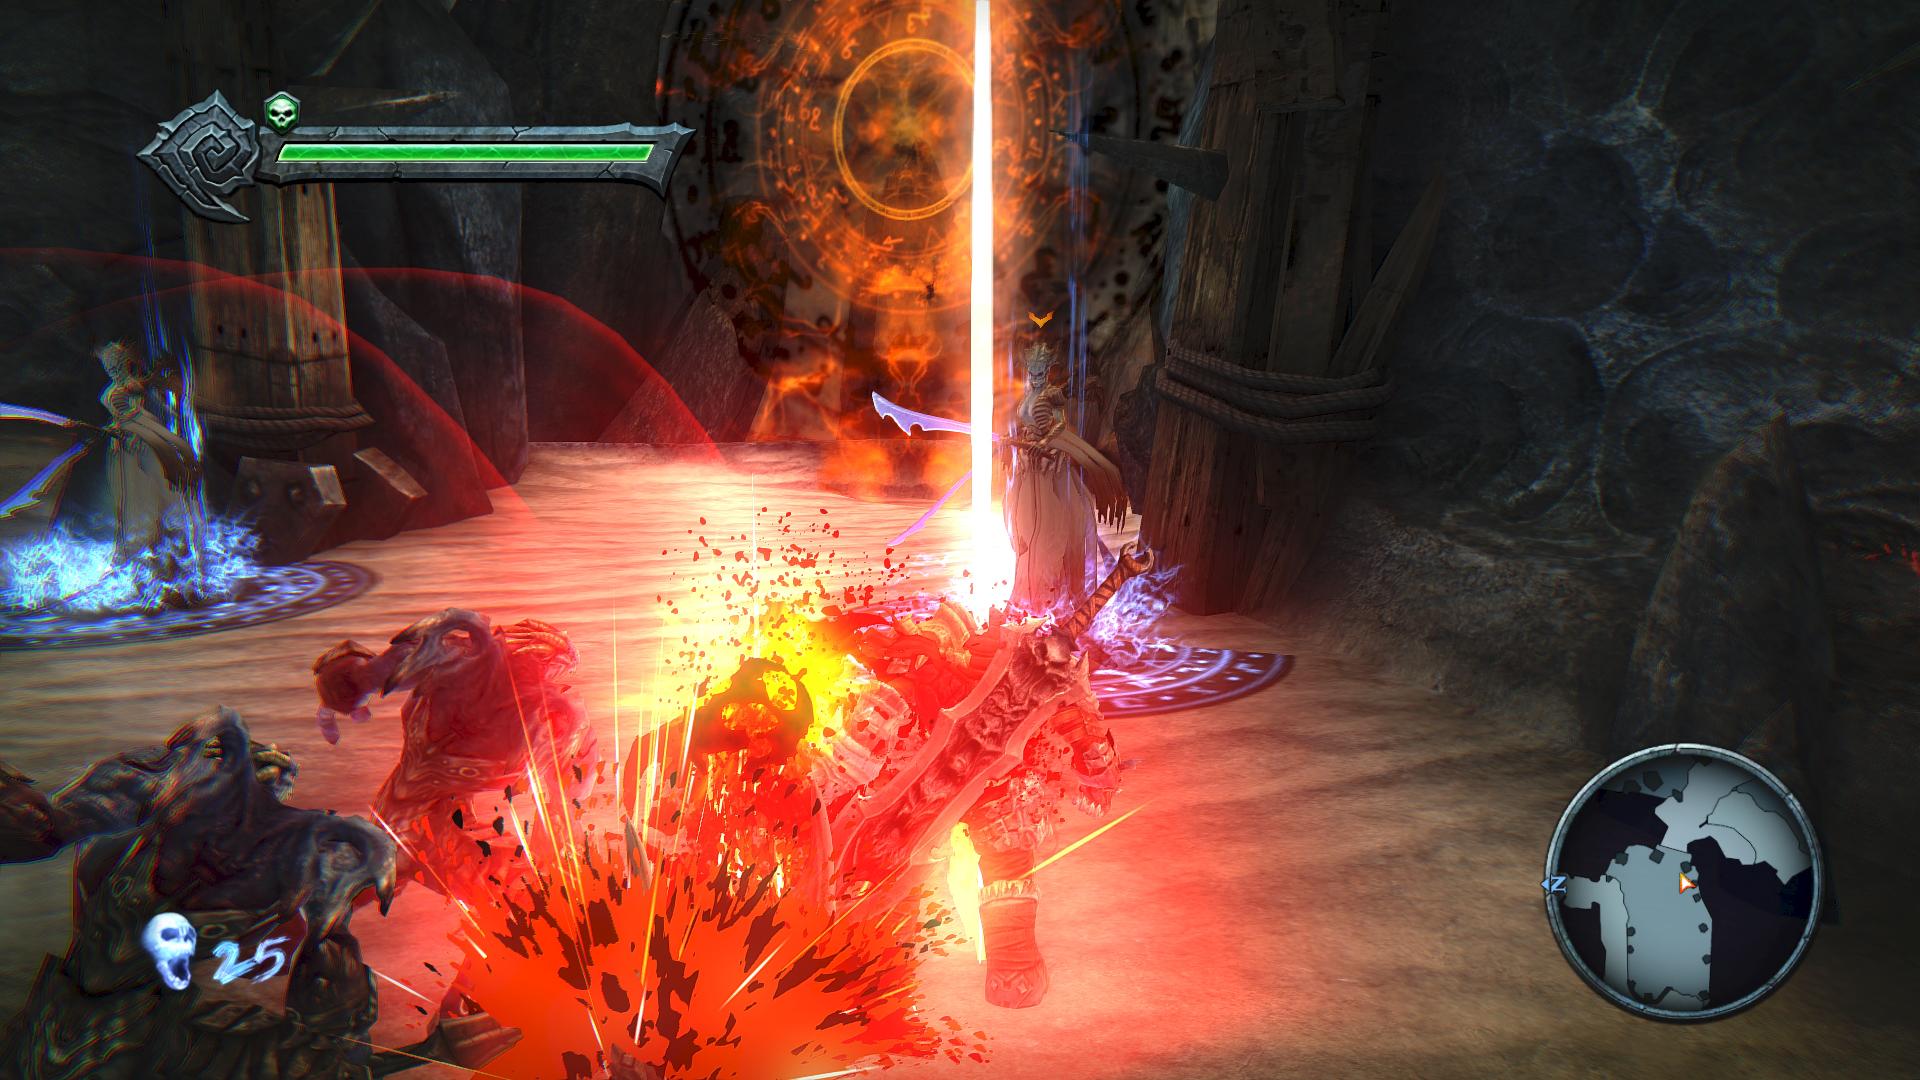 Darksiders: Warmastered Edition - Darksiders